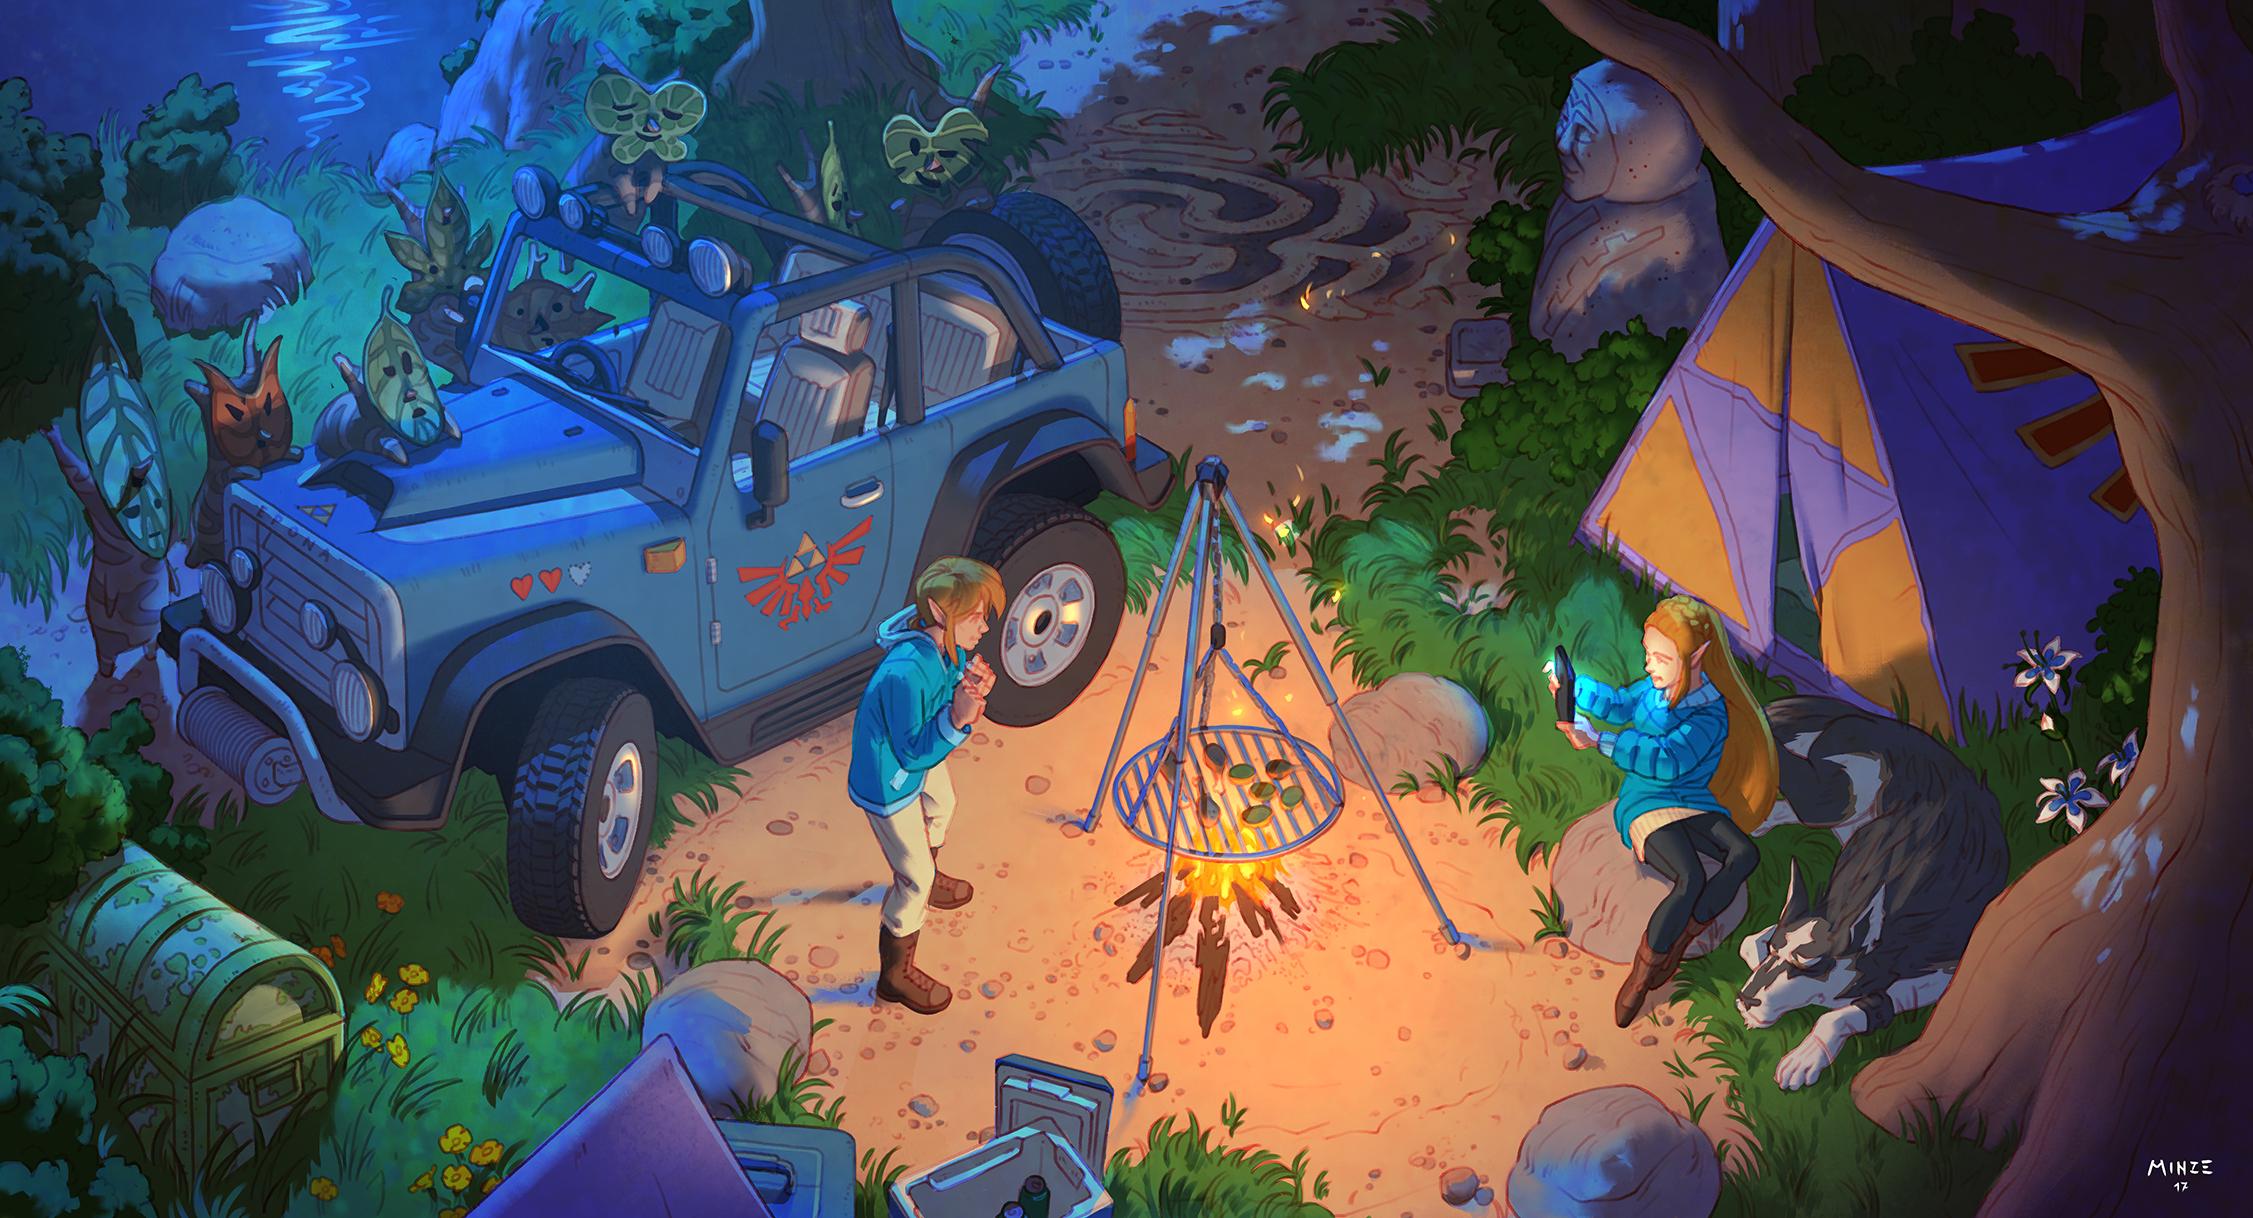 140 The Legend of Zelda Breath of the Wild HD Wallpapers 2253x1218